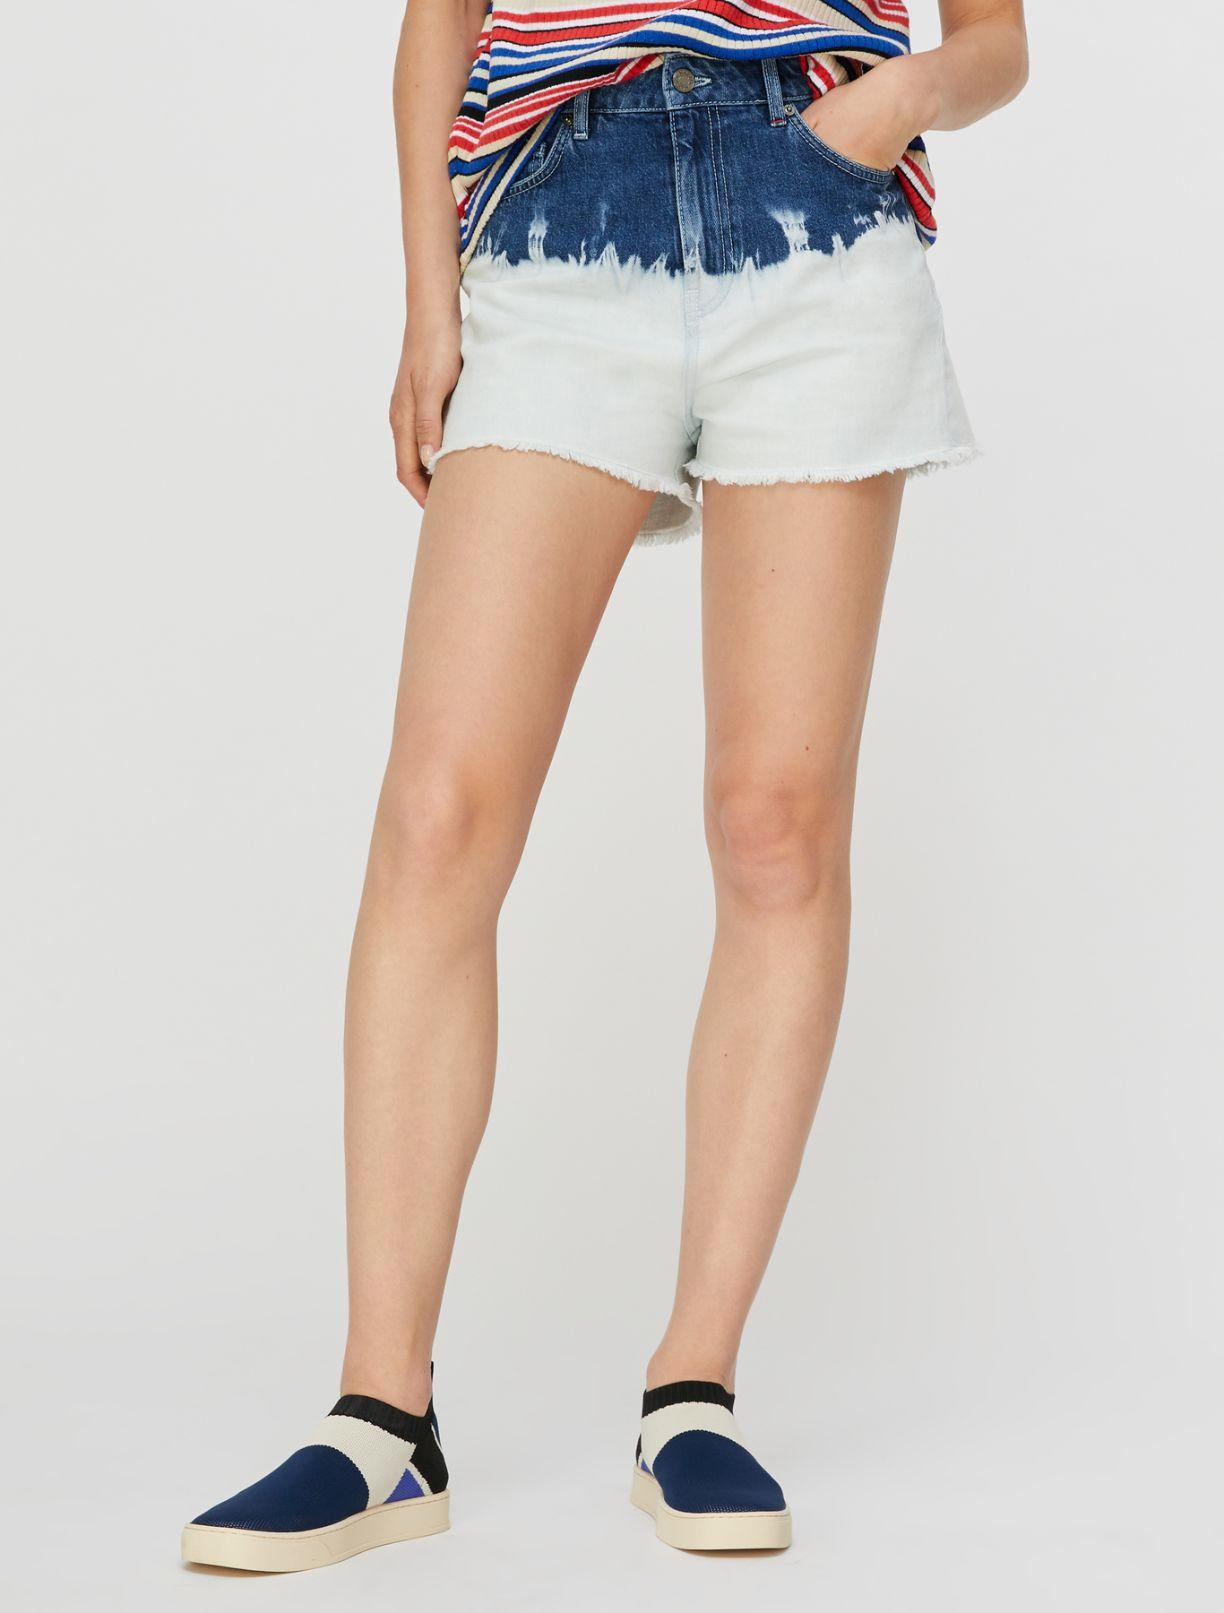 DORELLA Short trouser light blue pattern 1